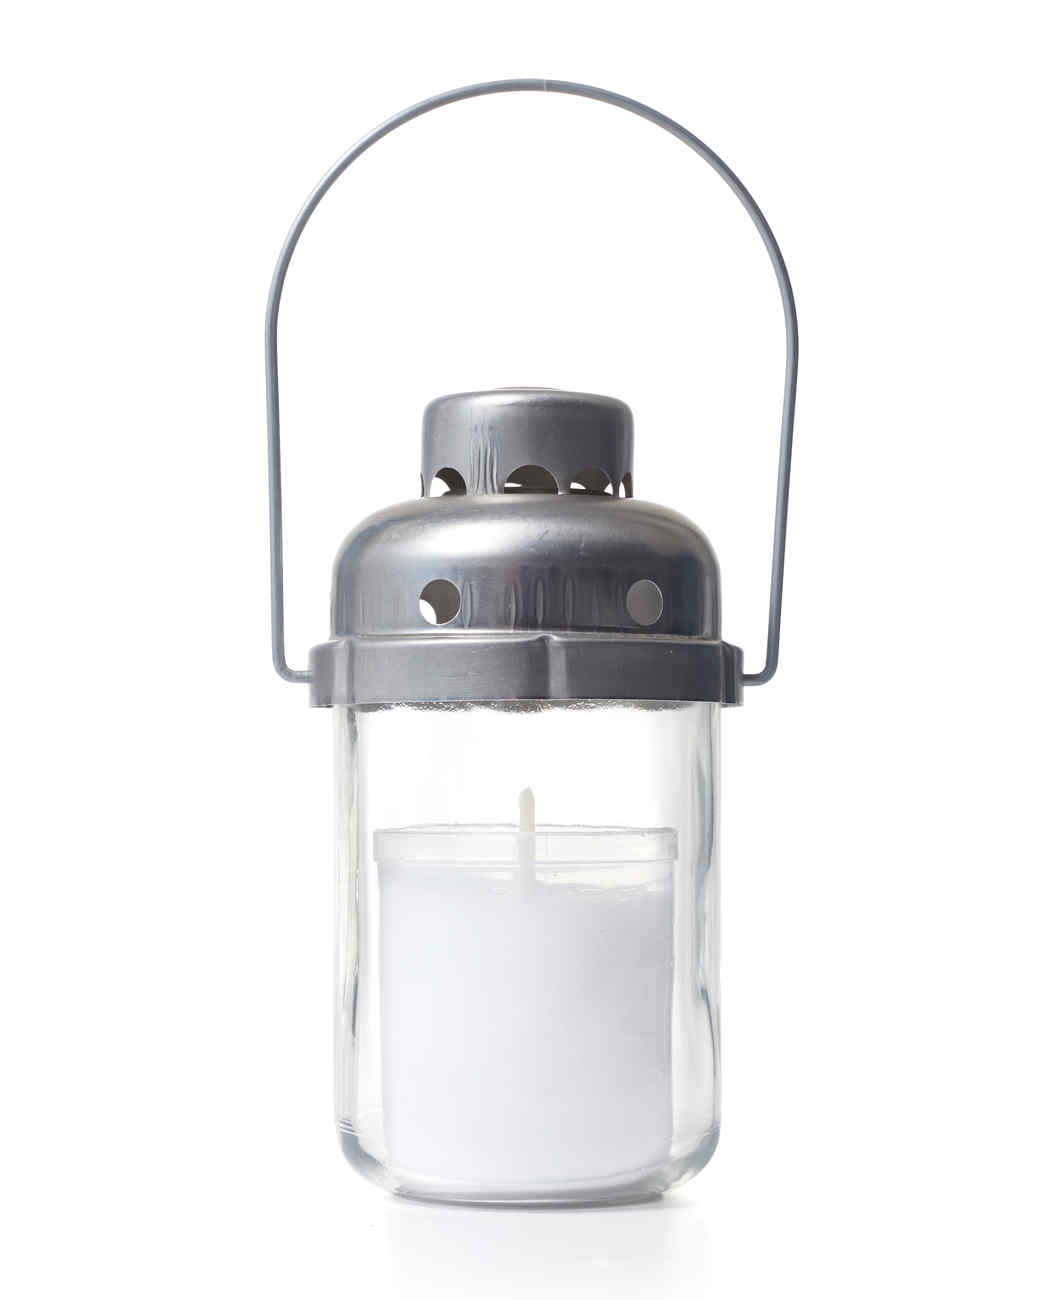 lantern-071-d111215.jpg